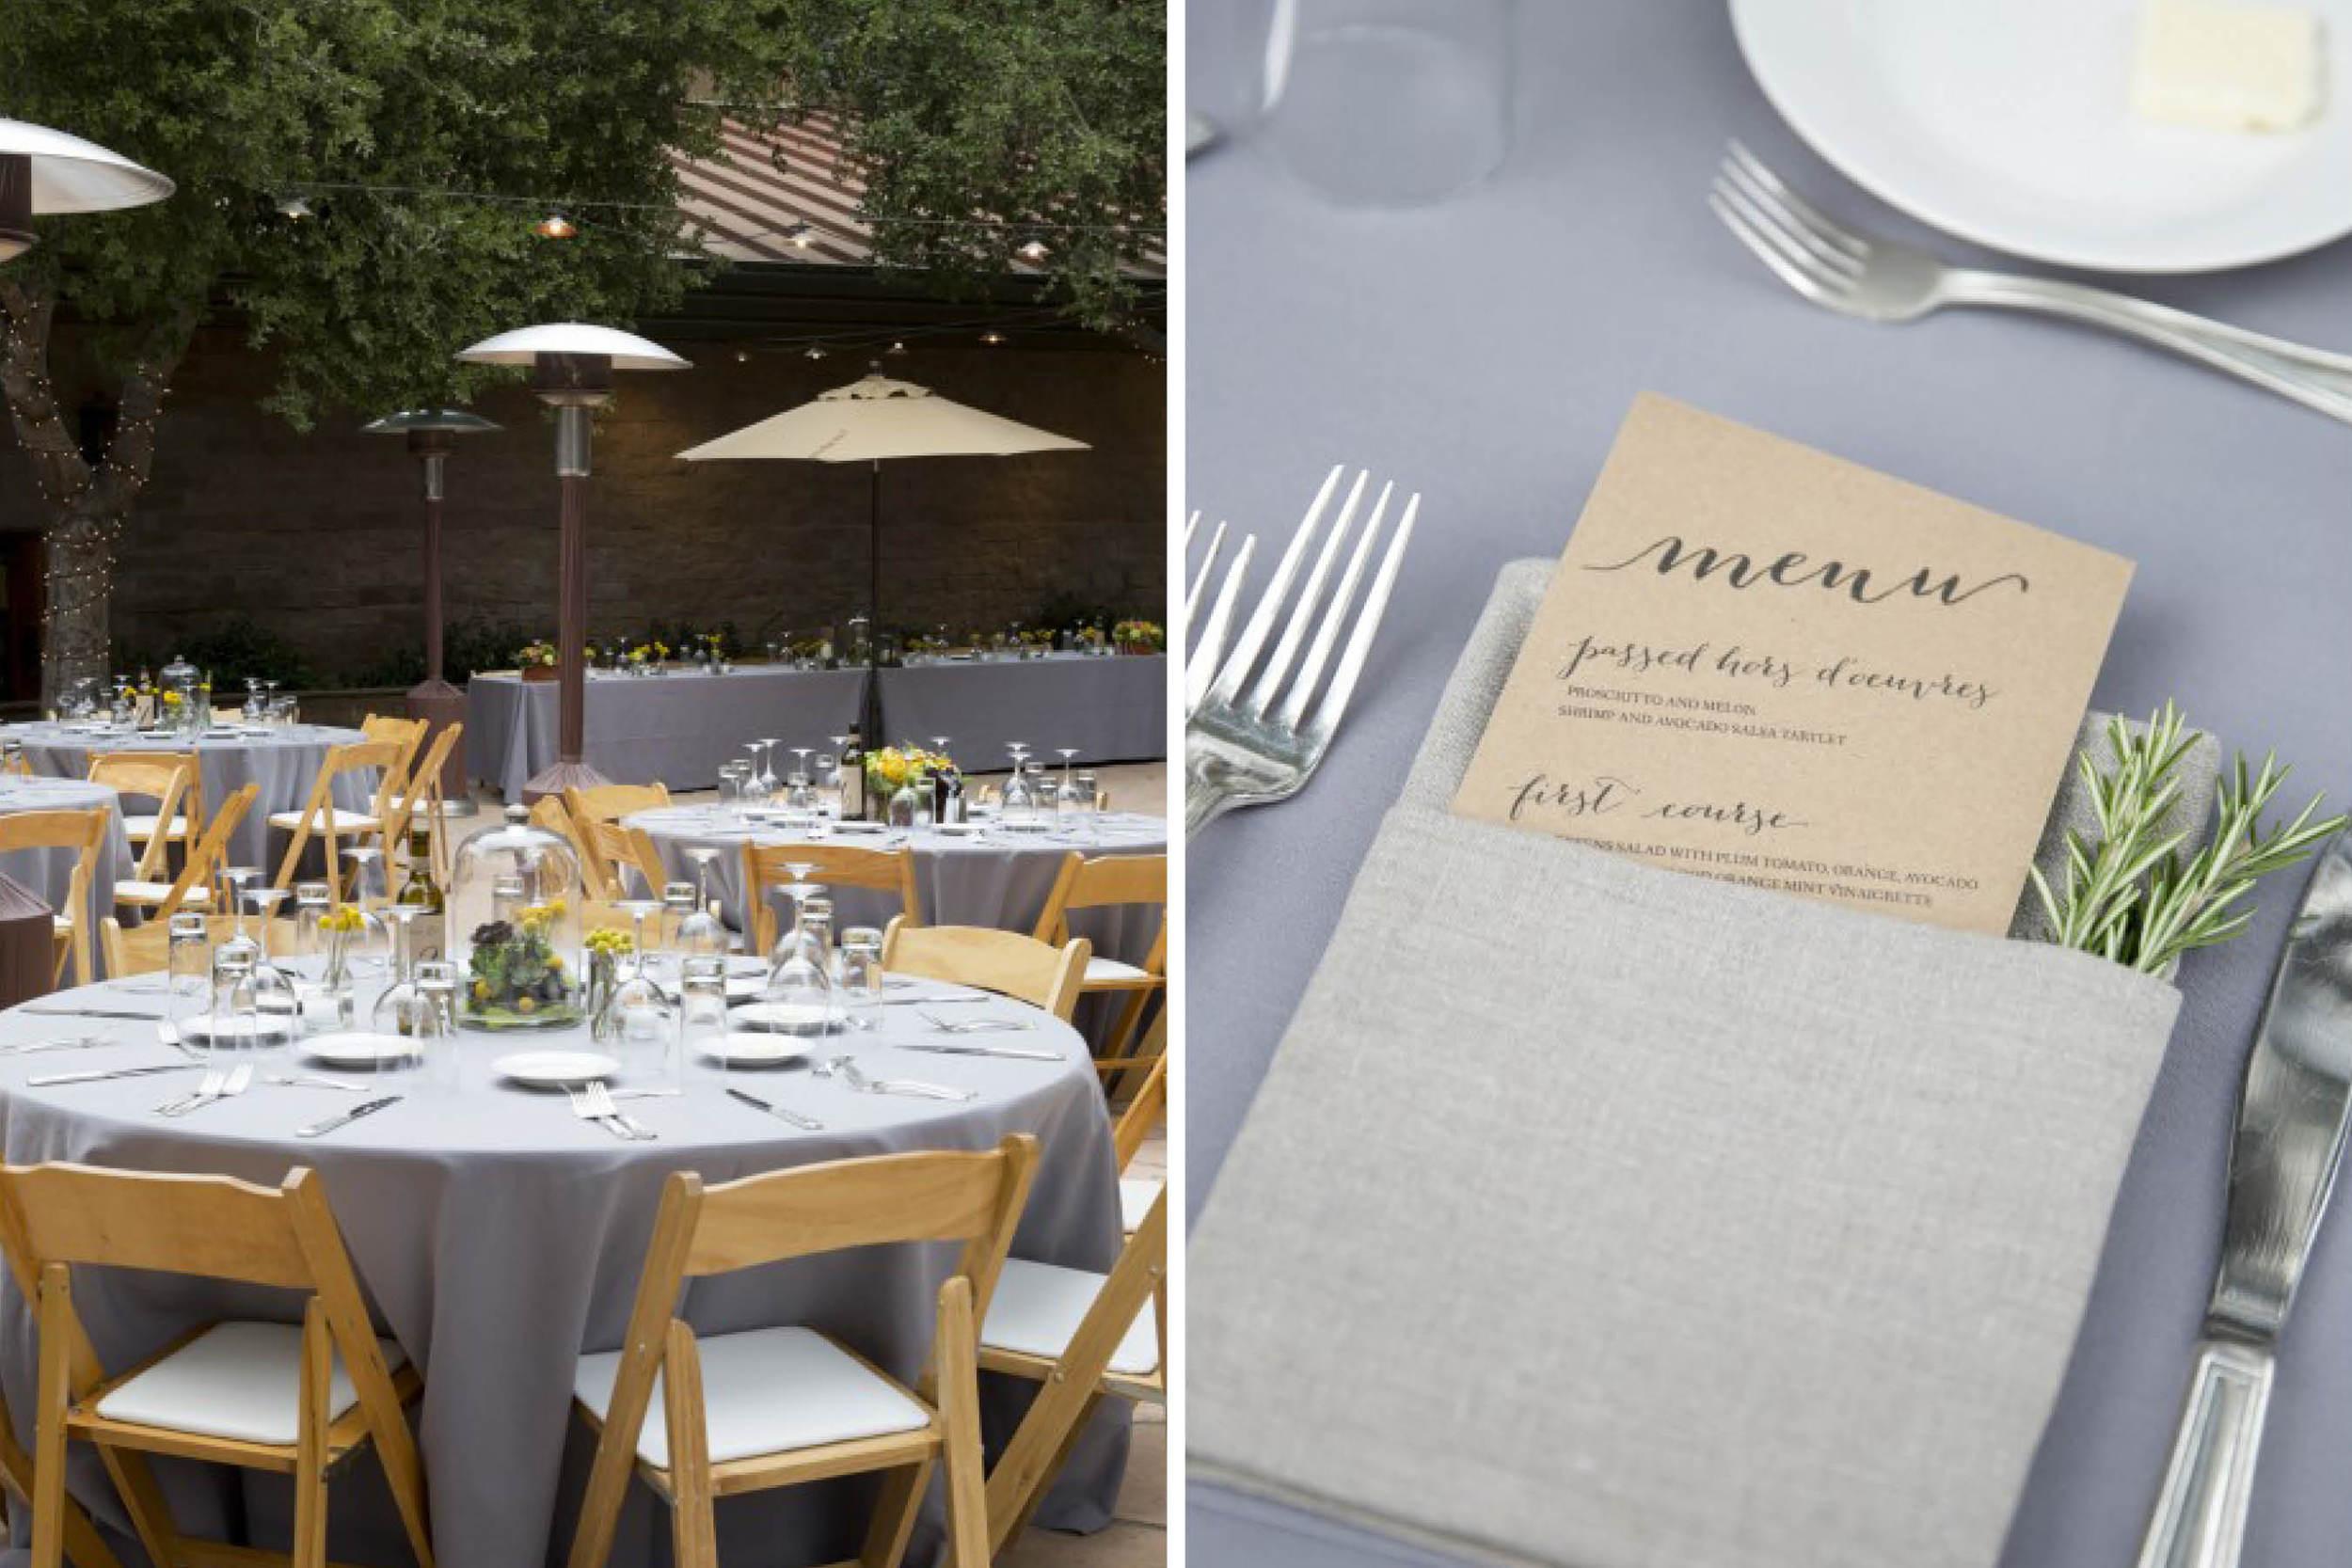 firestone-winery-vineyard-wedding-planner-coordinator-santa-barbara-ynez-los-olivos (27).jpg